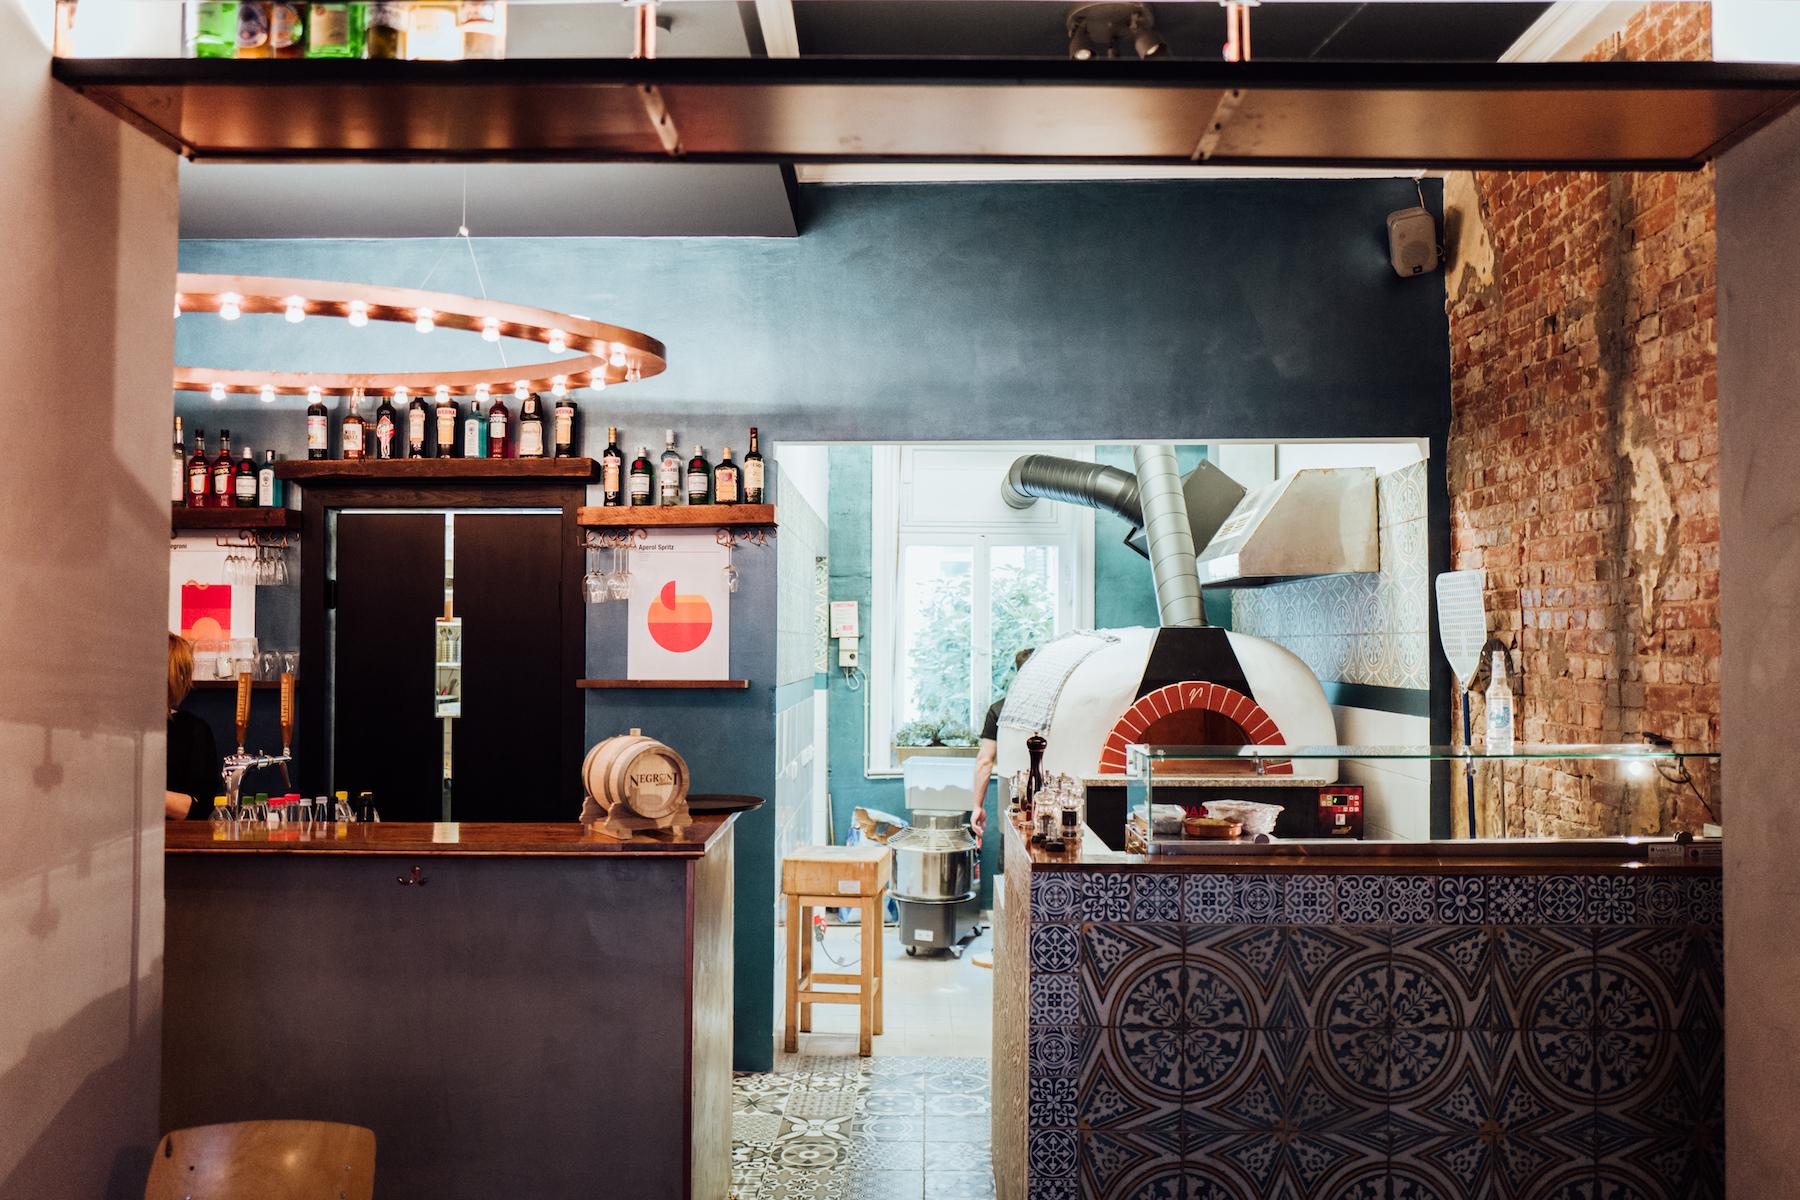 Tazzi Pizza St Pauli geheimtipp hamburg lisa knauer restaurant 35